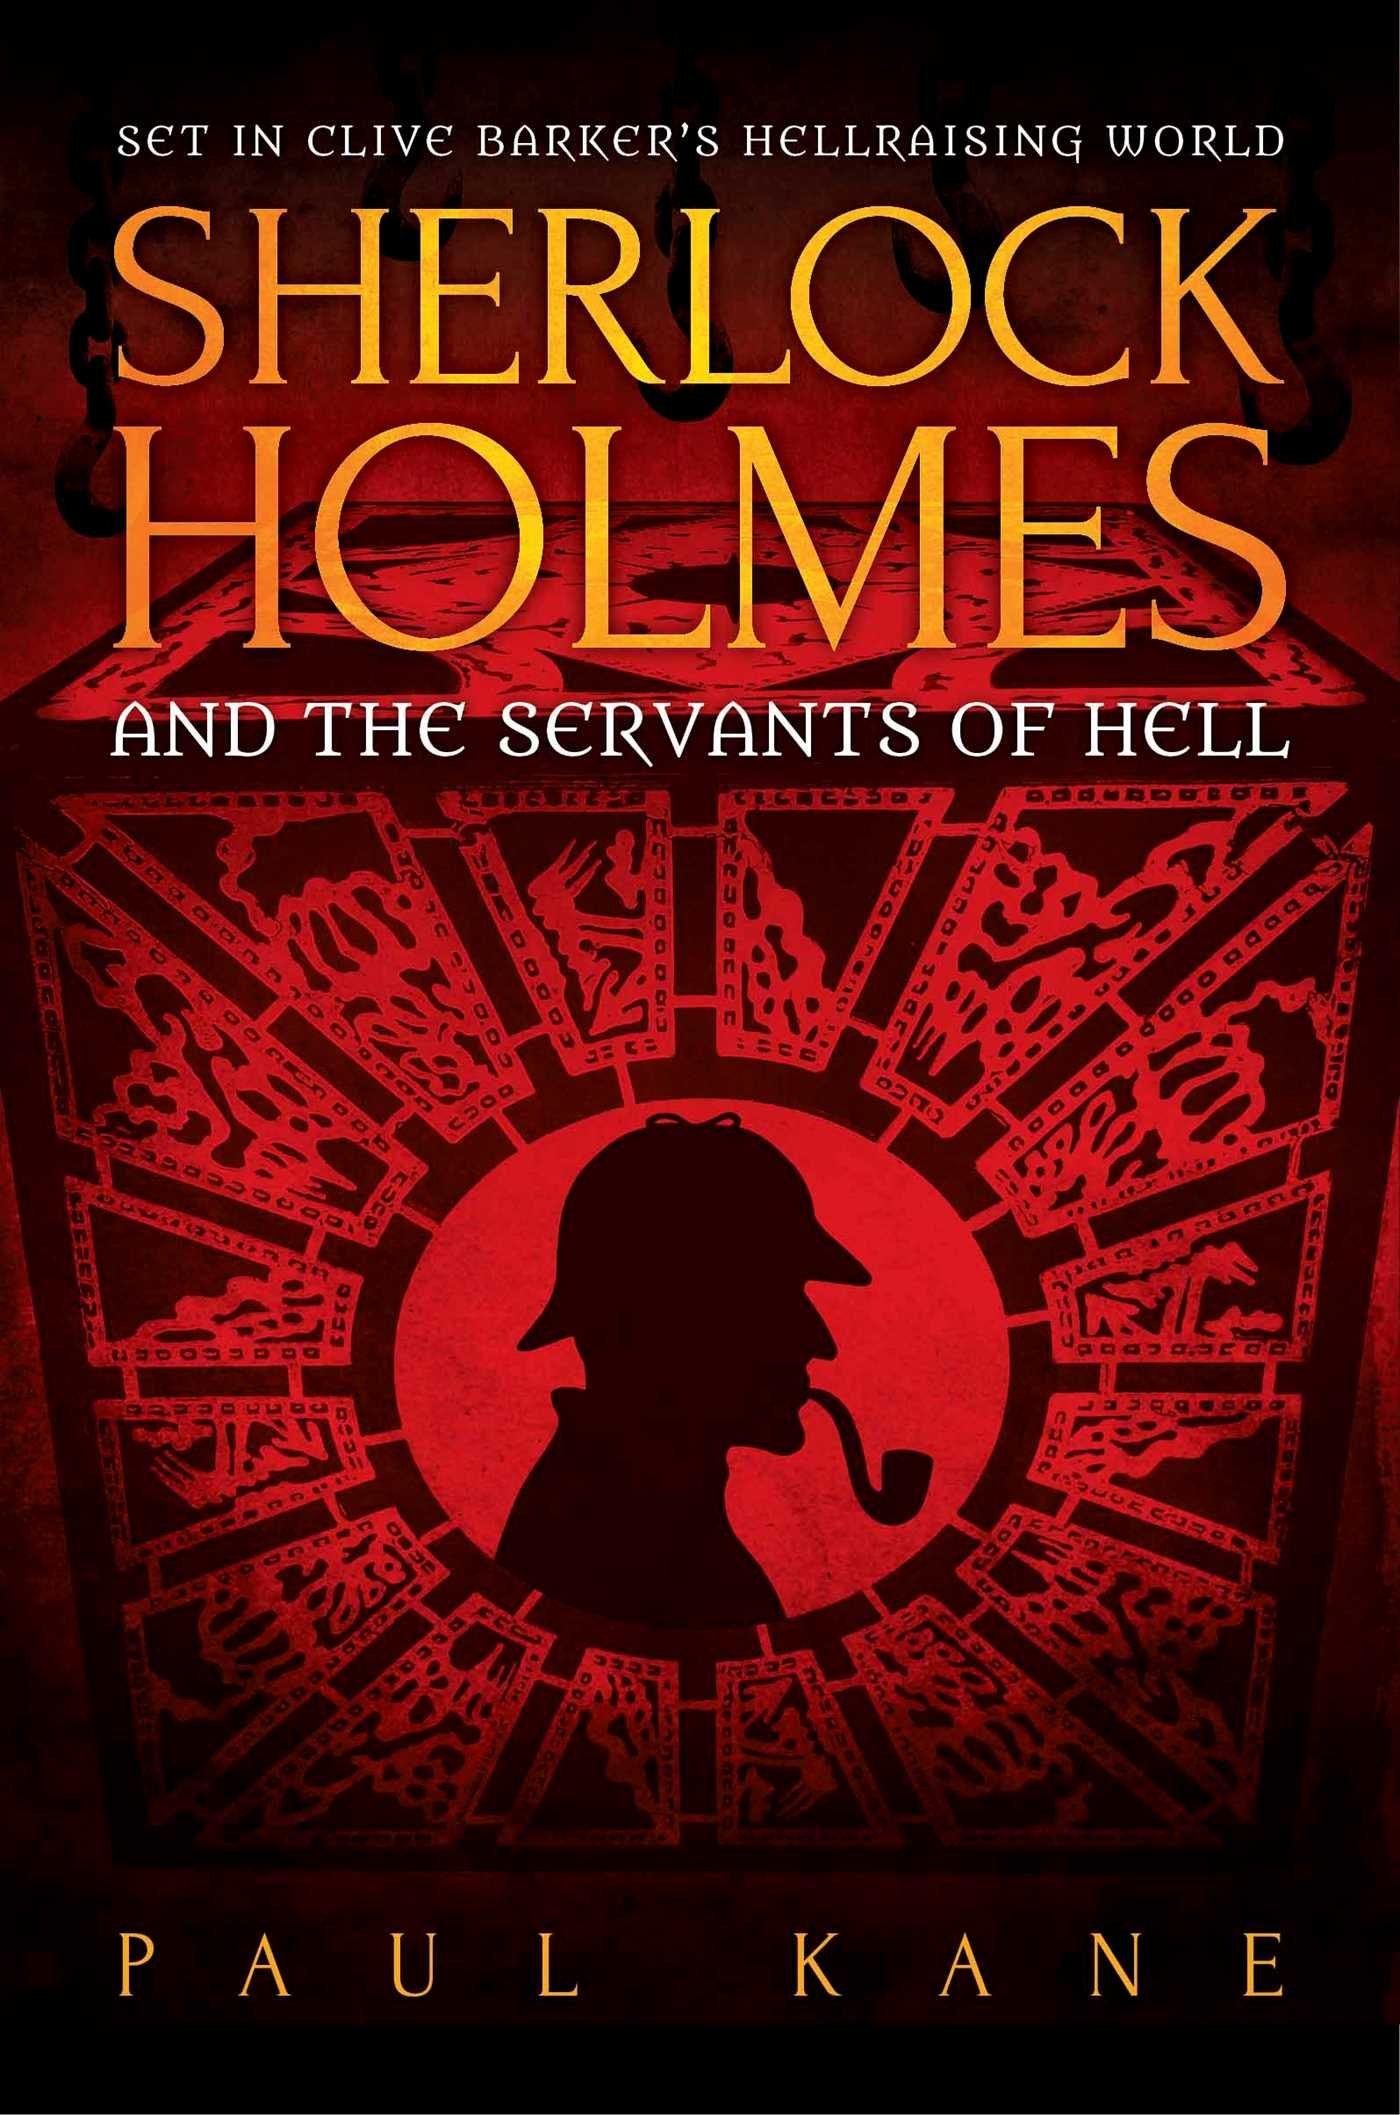 Sherlock-holmes-servants-of-hell-book-cover